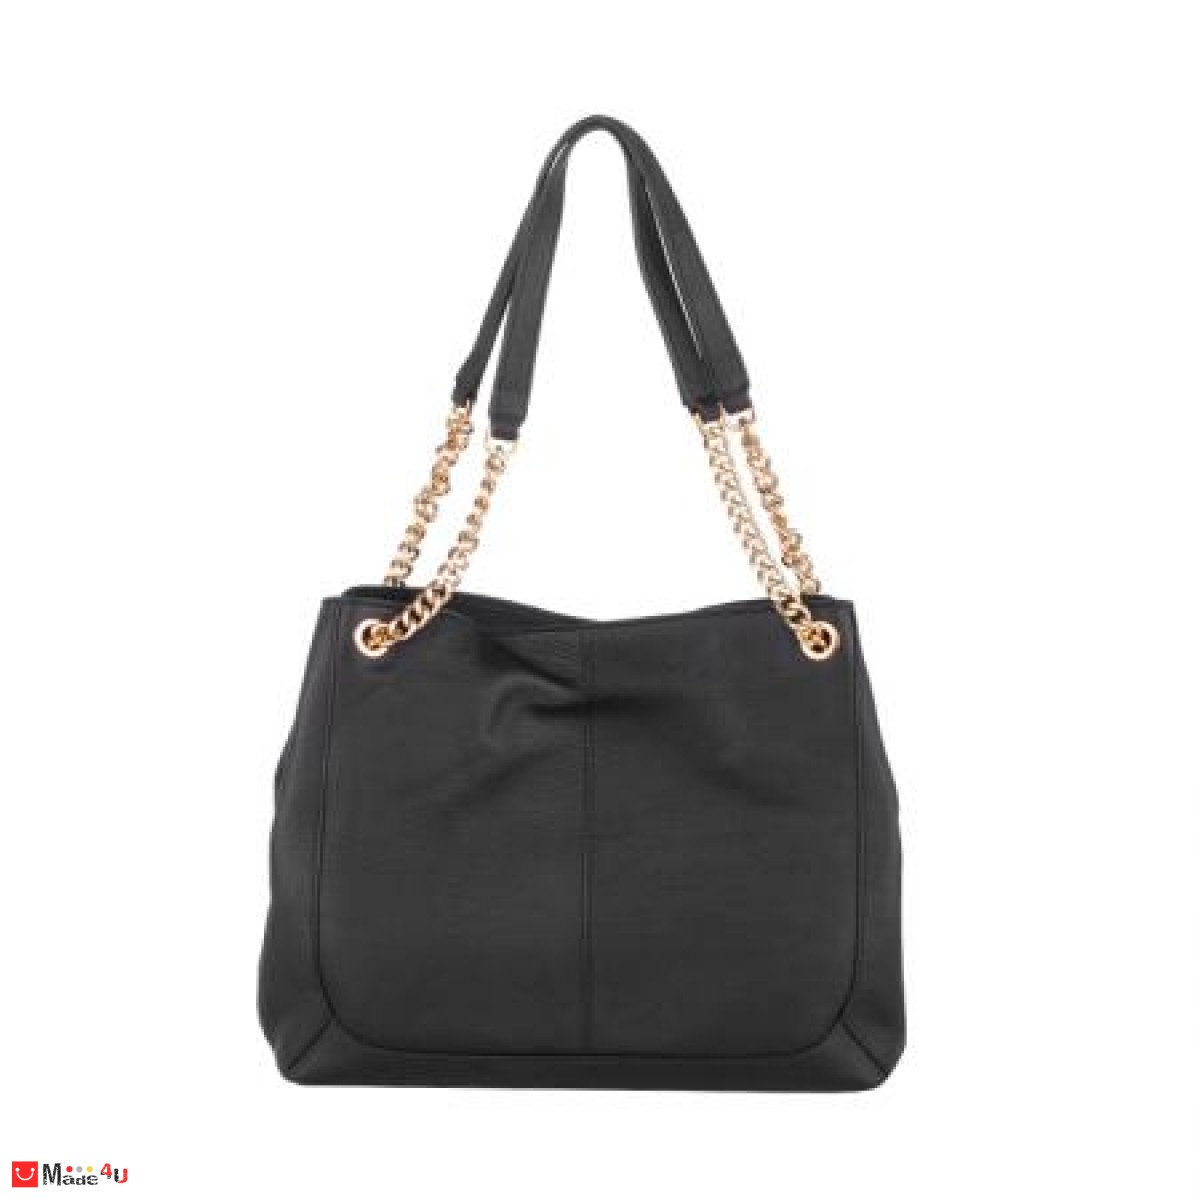 Дамска чанта естествена кожа, 32х27см, черна